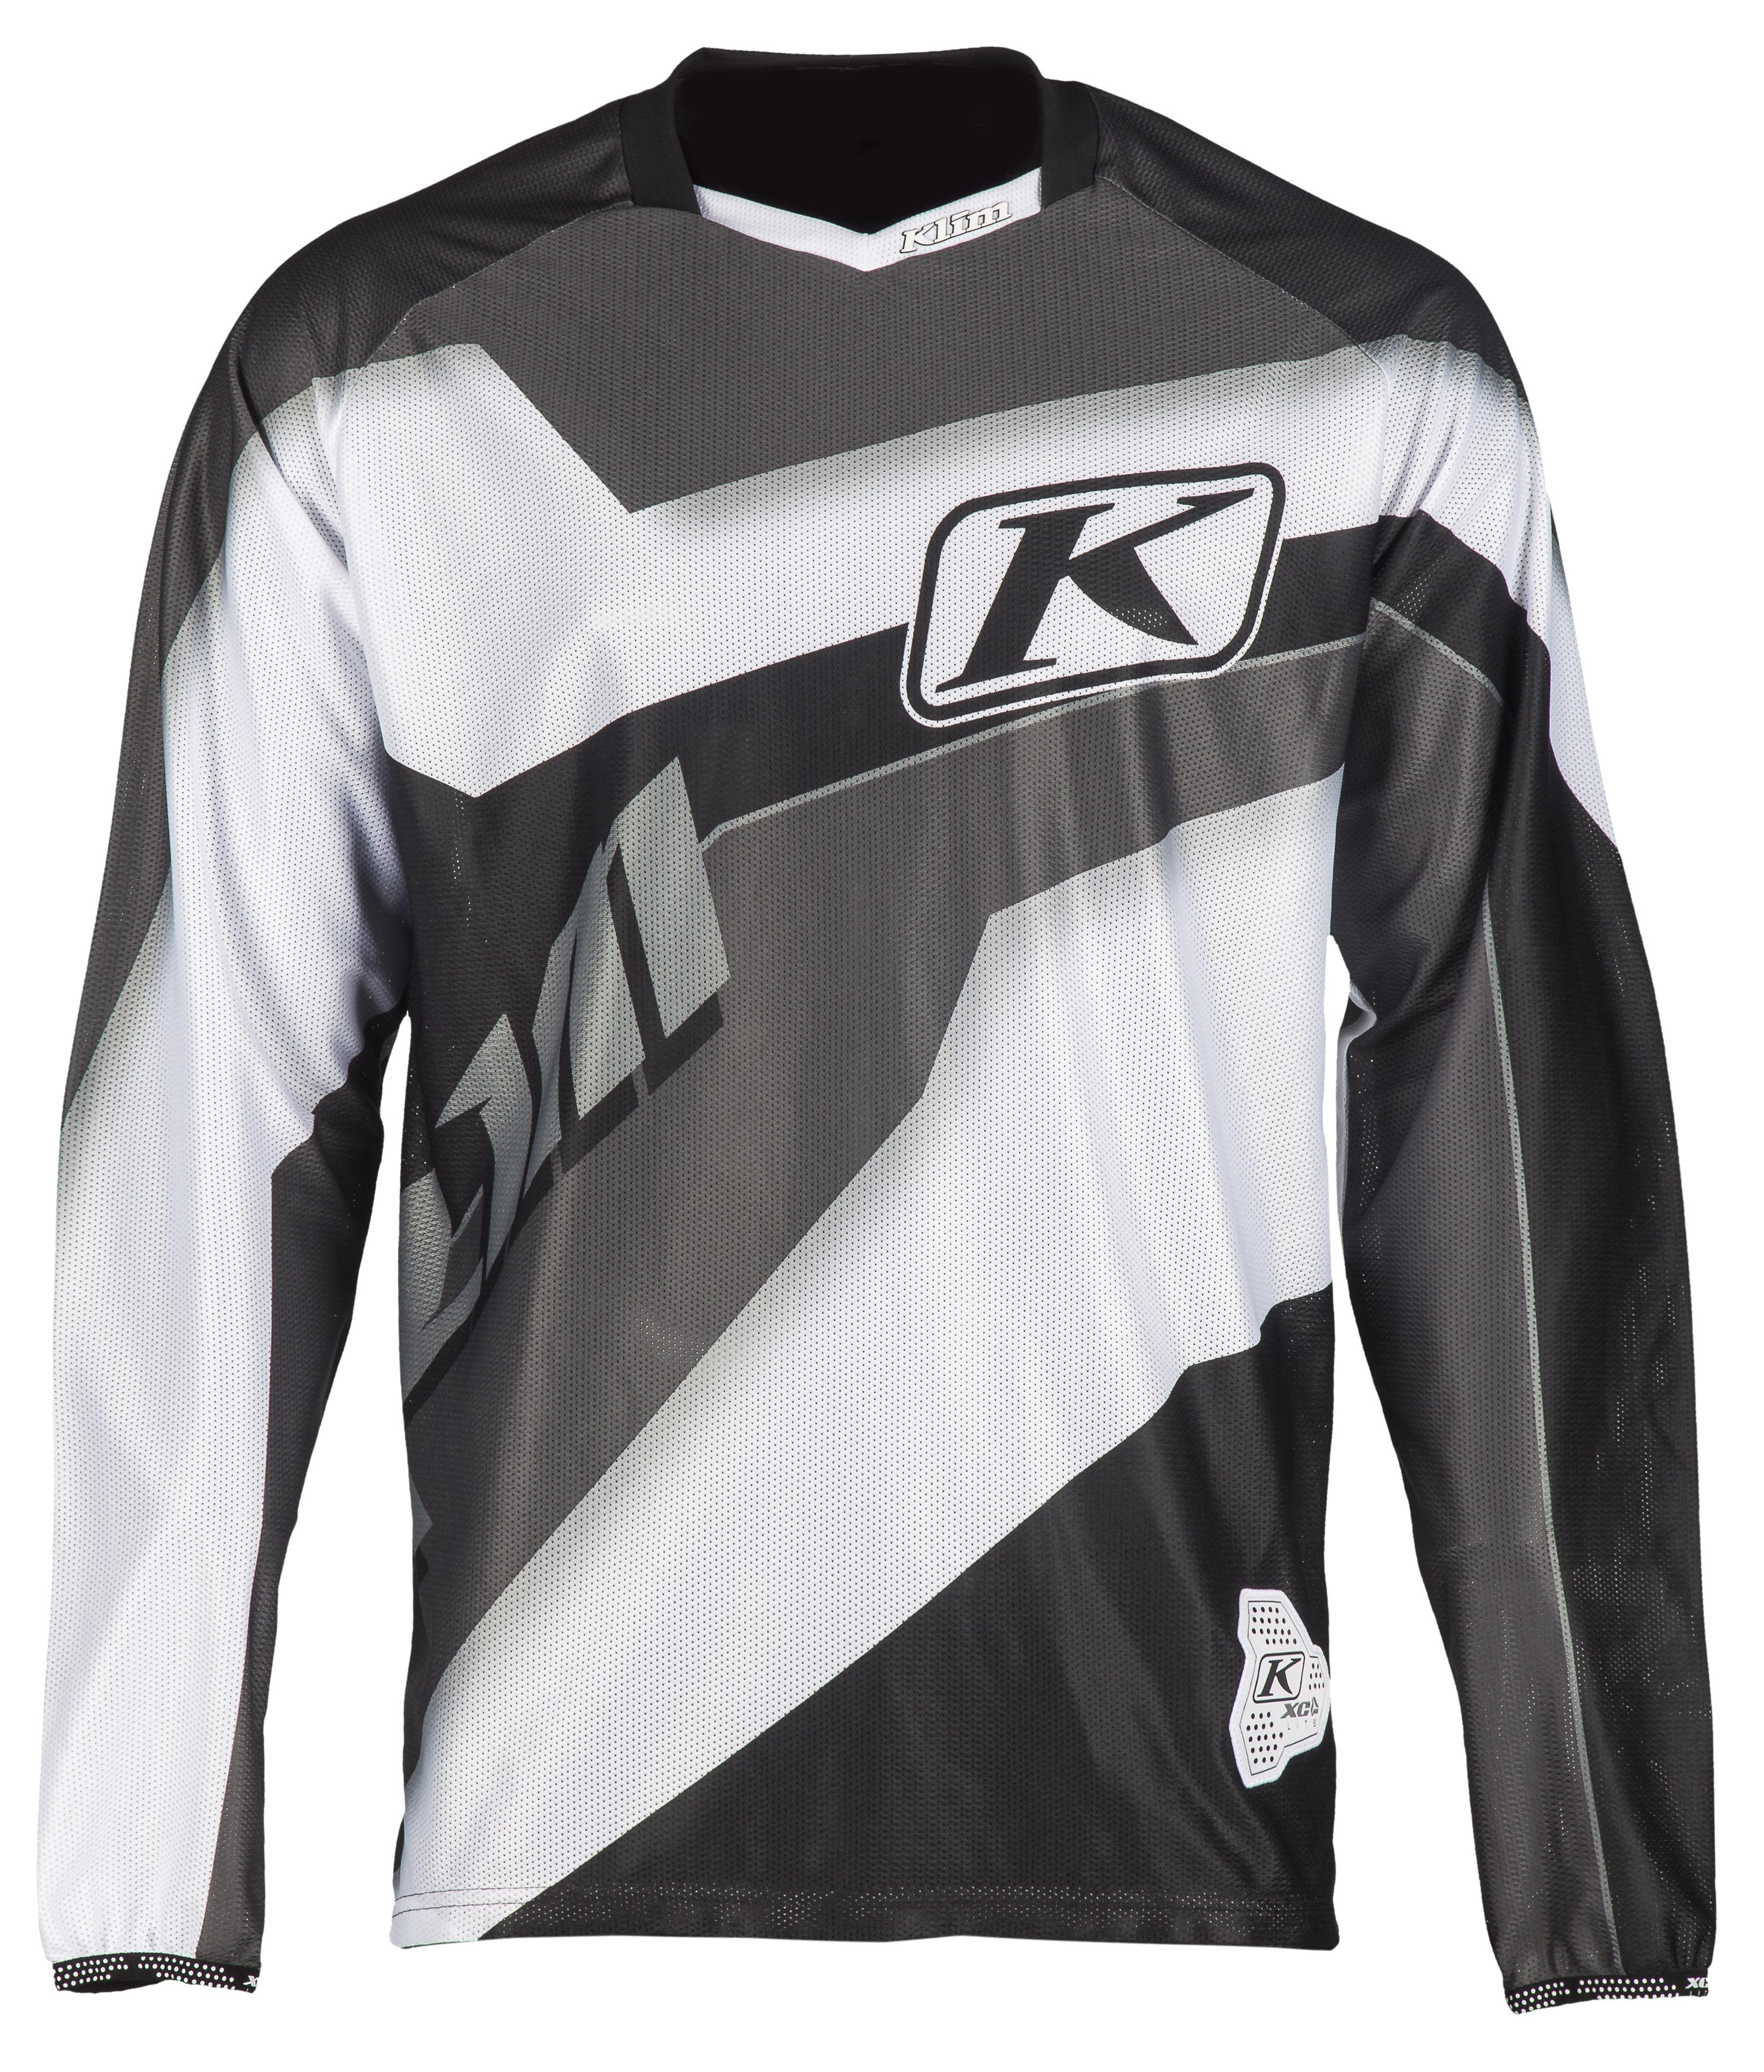 XC LITE Jersey 5003-002-600